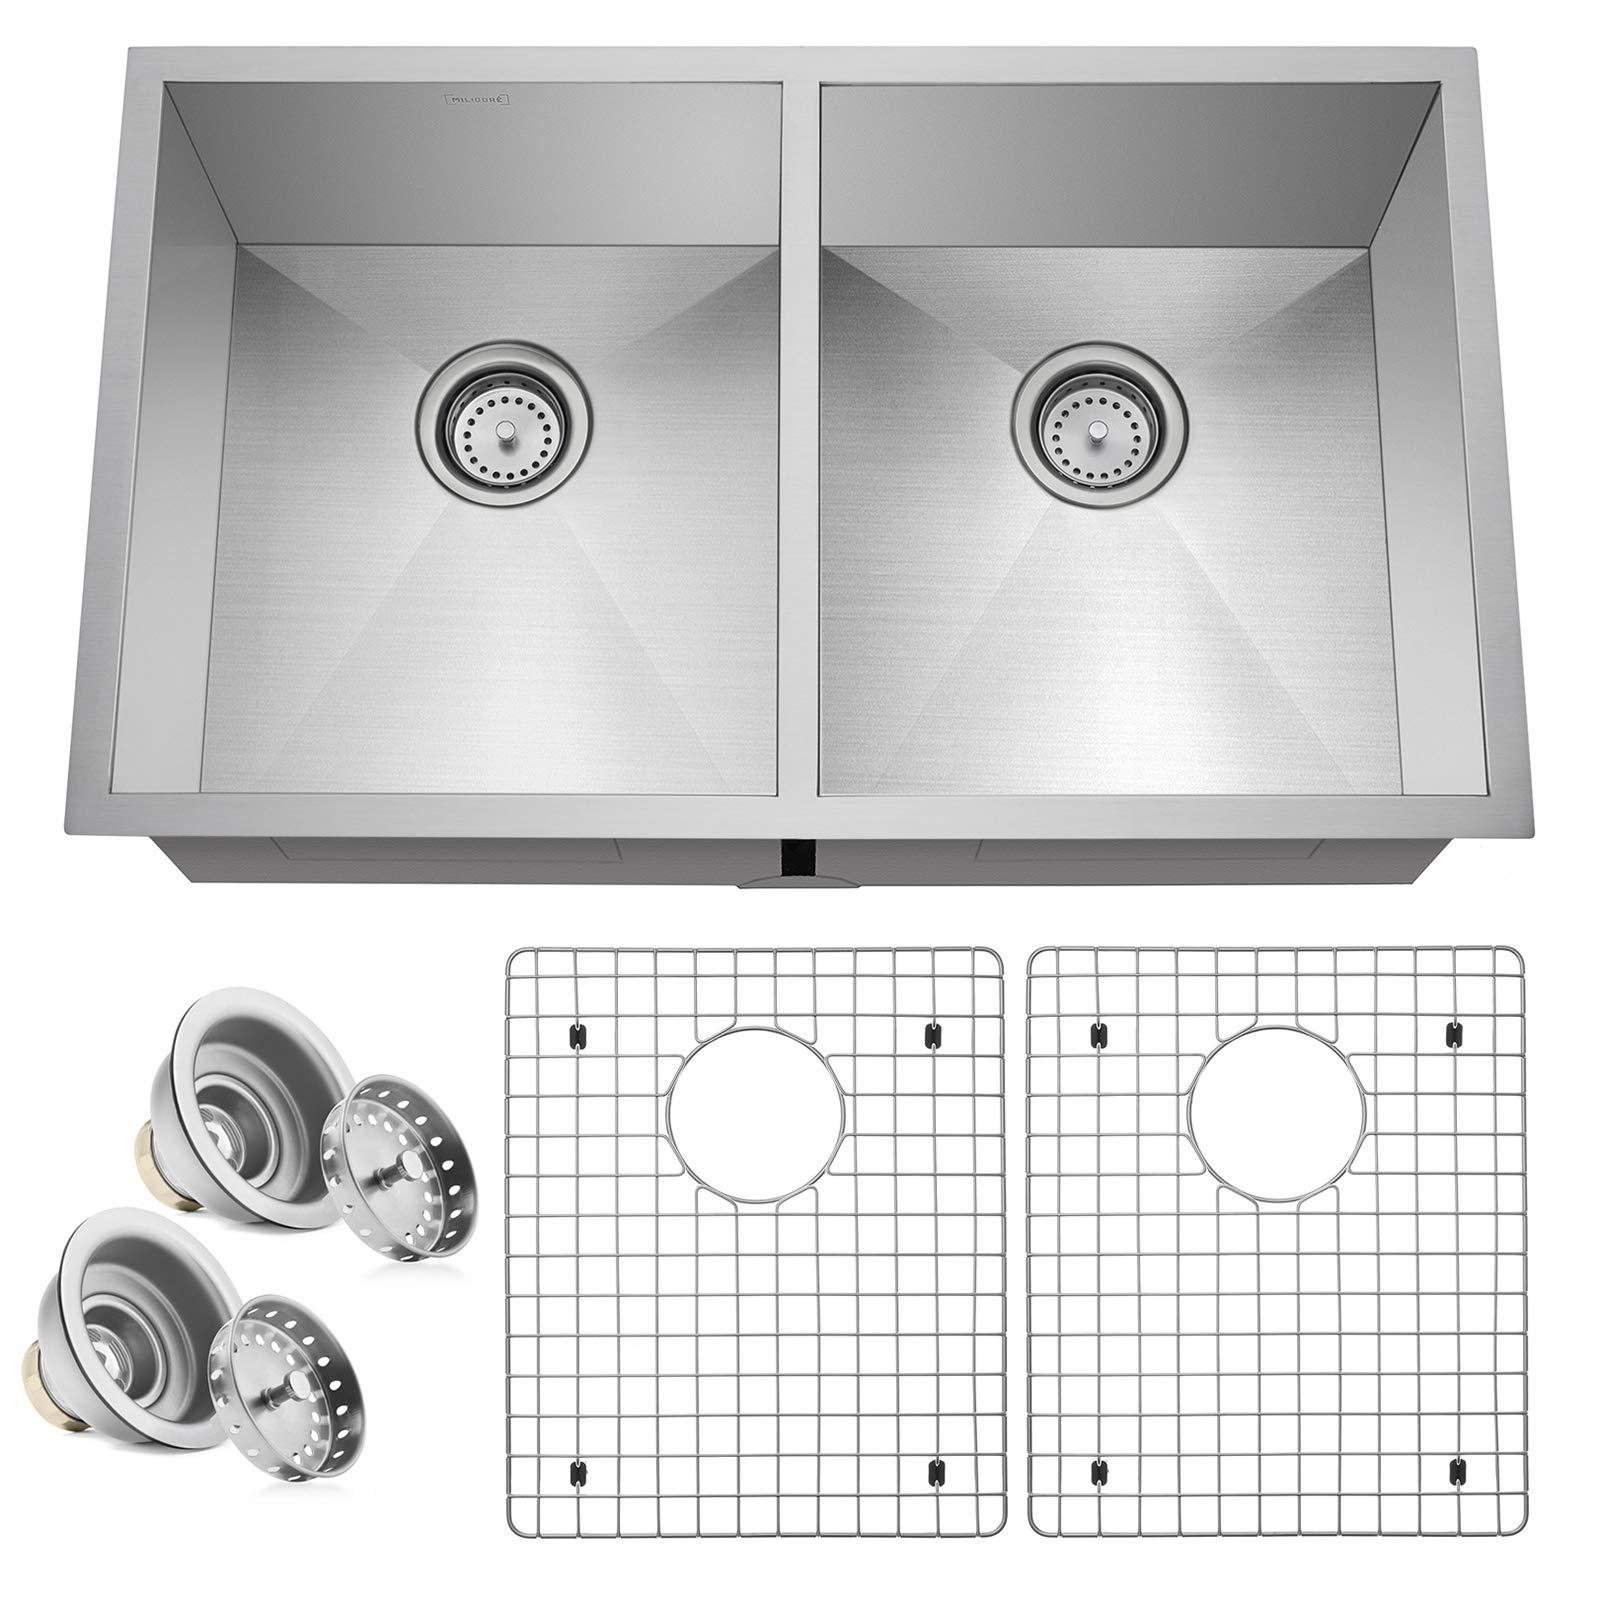 Miligore 32'' x 19'' x 10'' Deep Double Bowl (50/50 Split) Undermount Zero Radius 16-Gauge Stainless Steel Kitchen Sink - Includes Drains/Grids